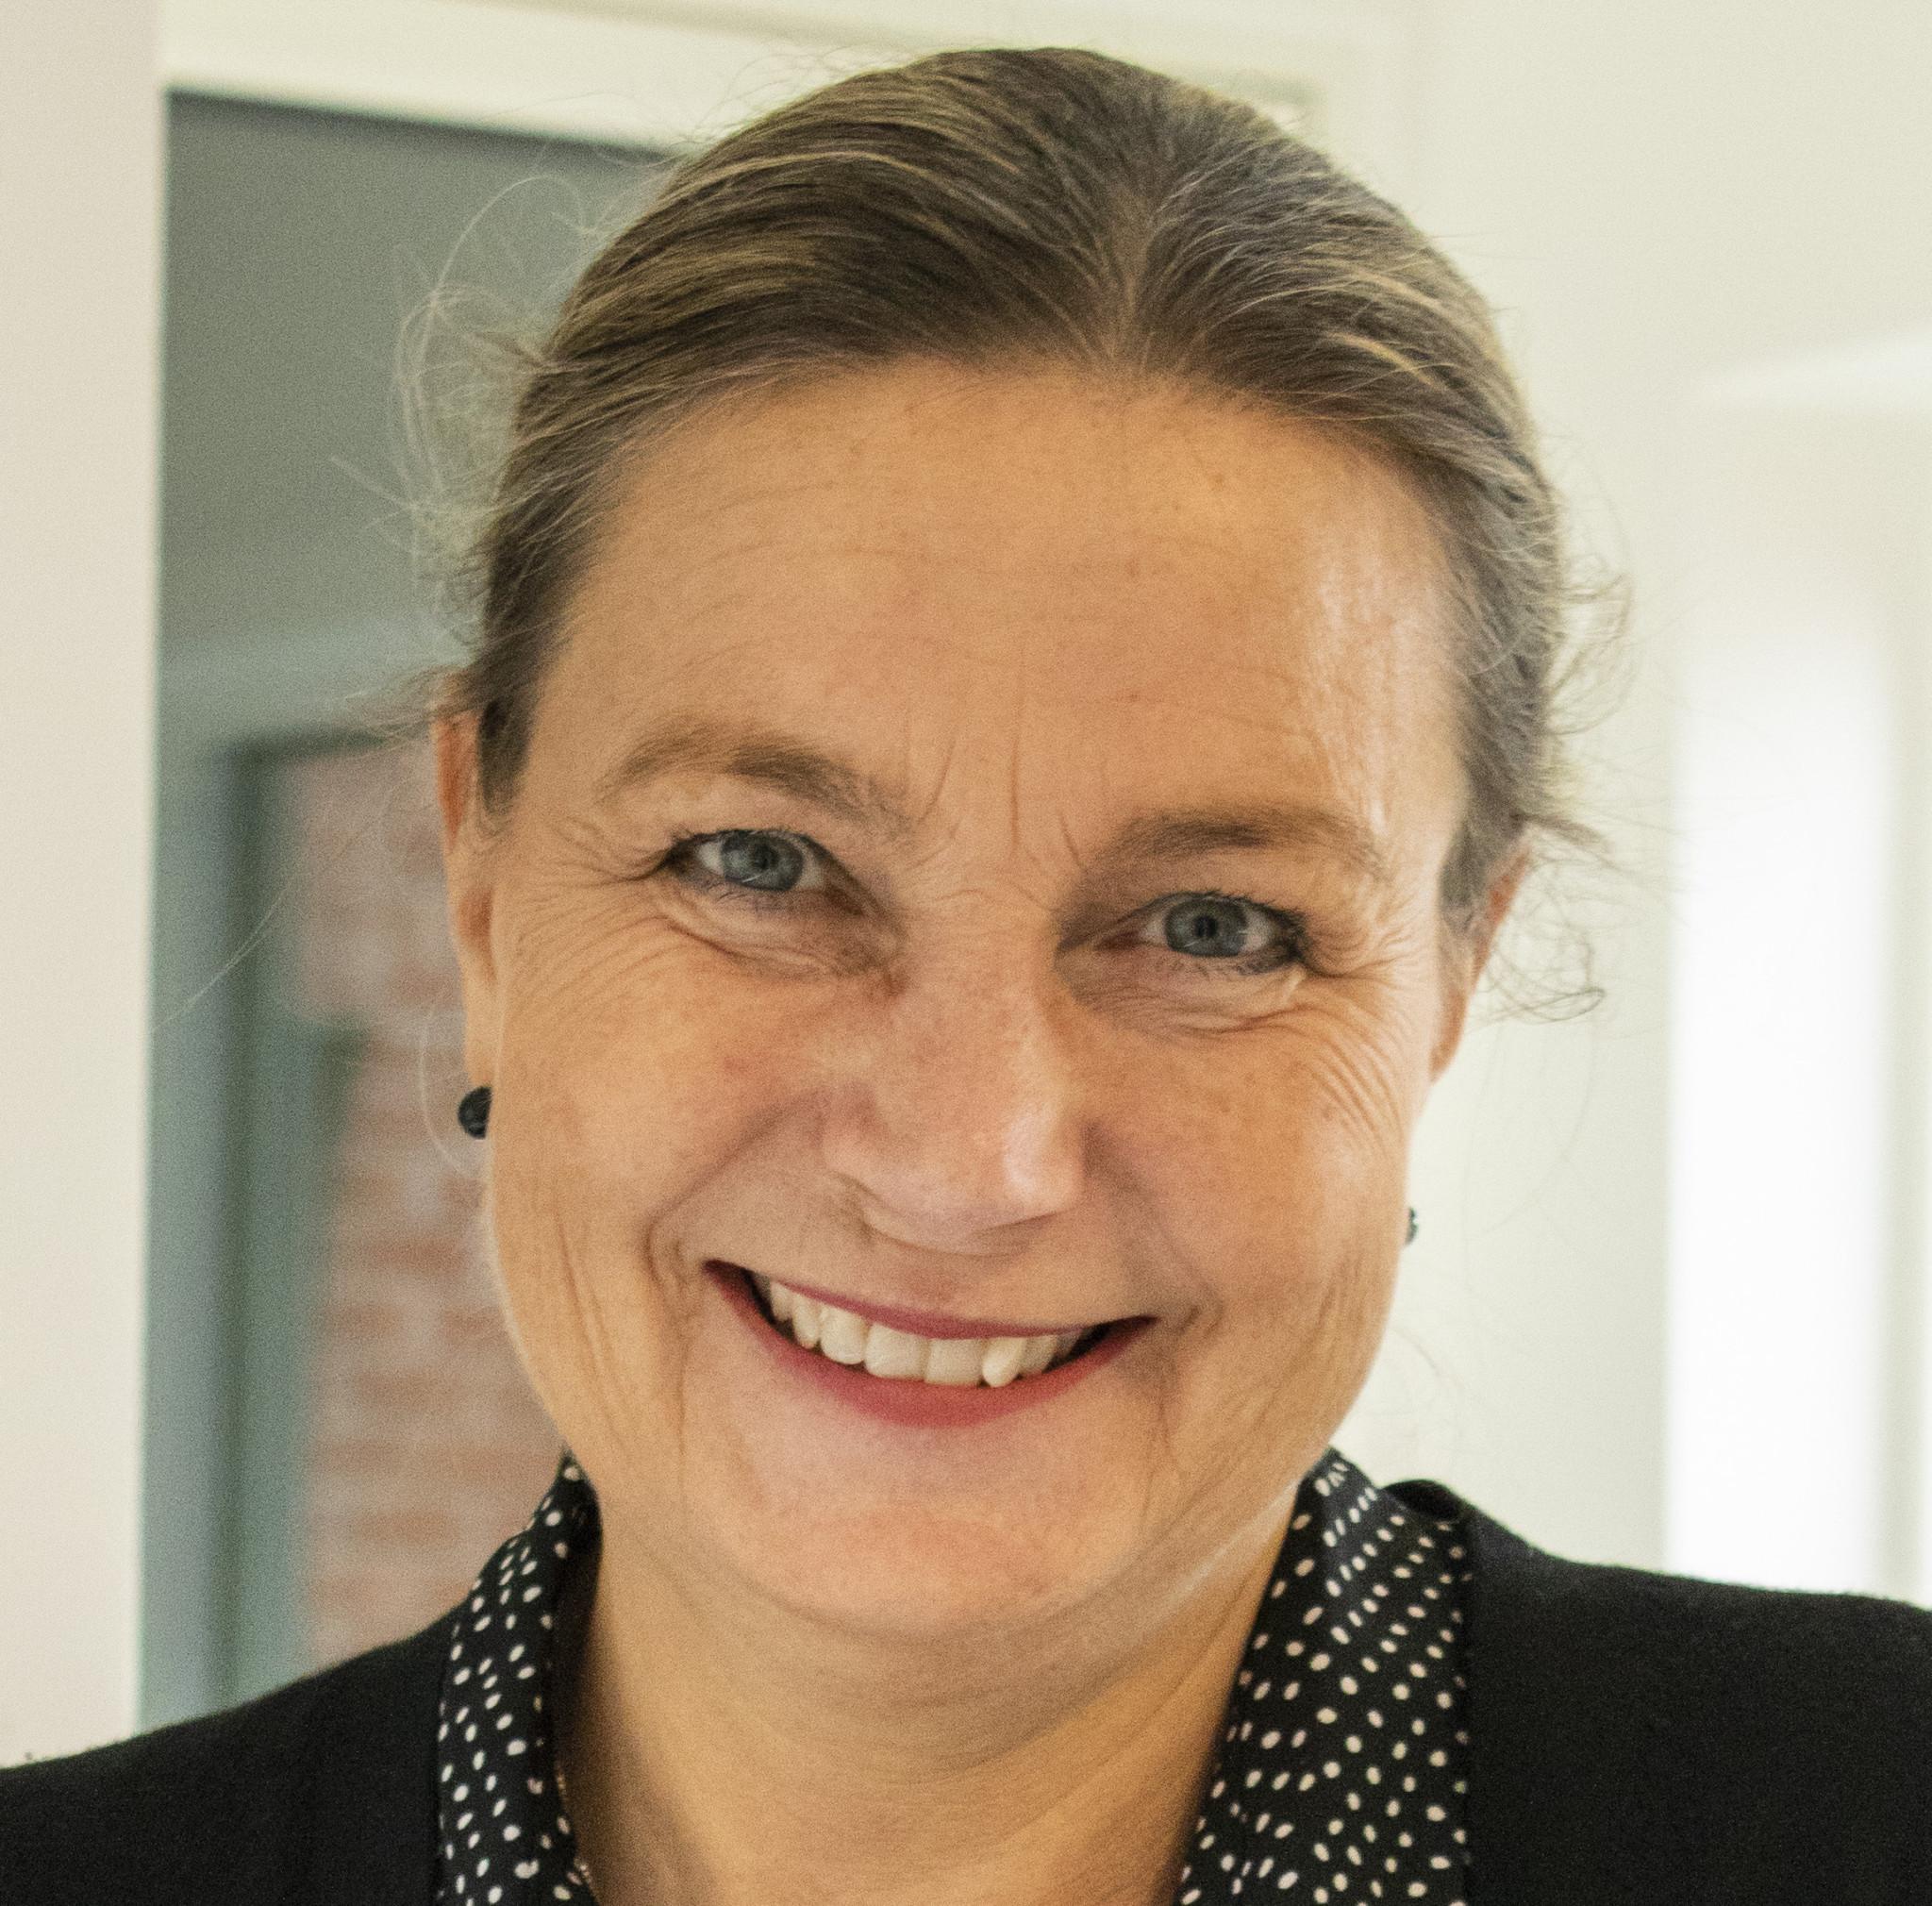 Katarina Ståhlkrantz